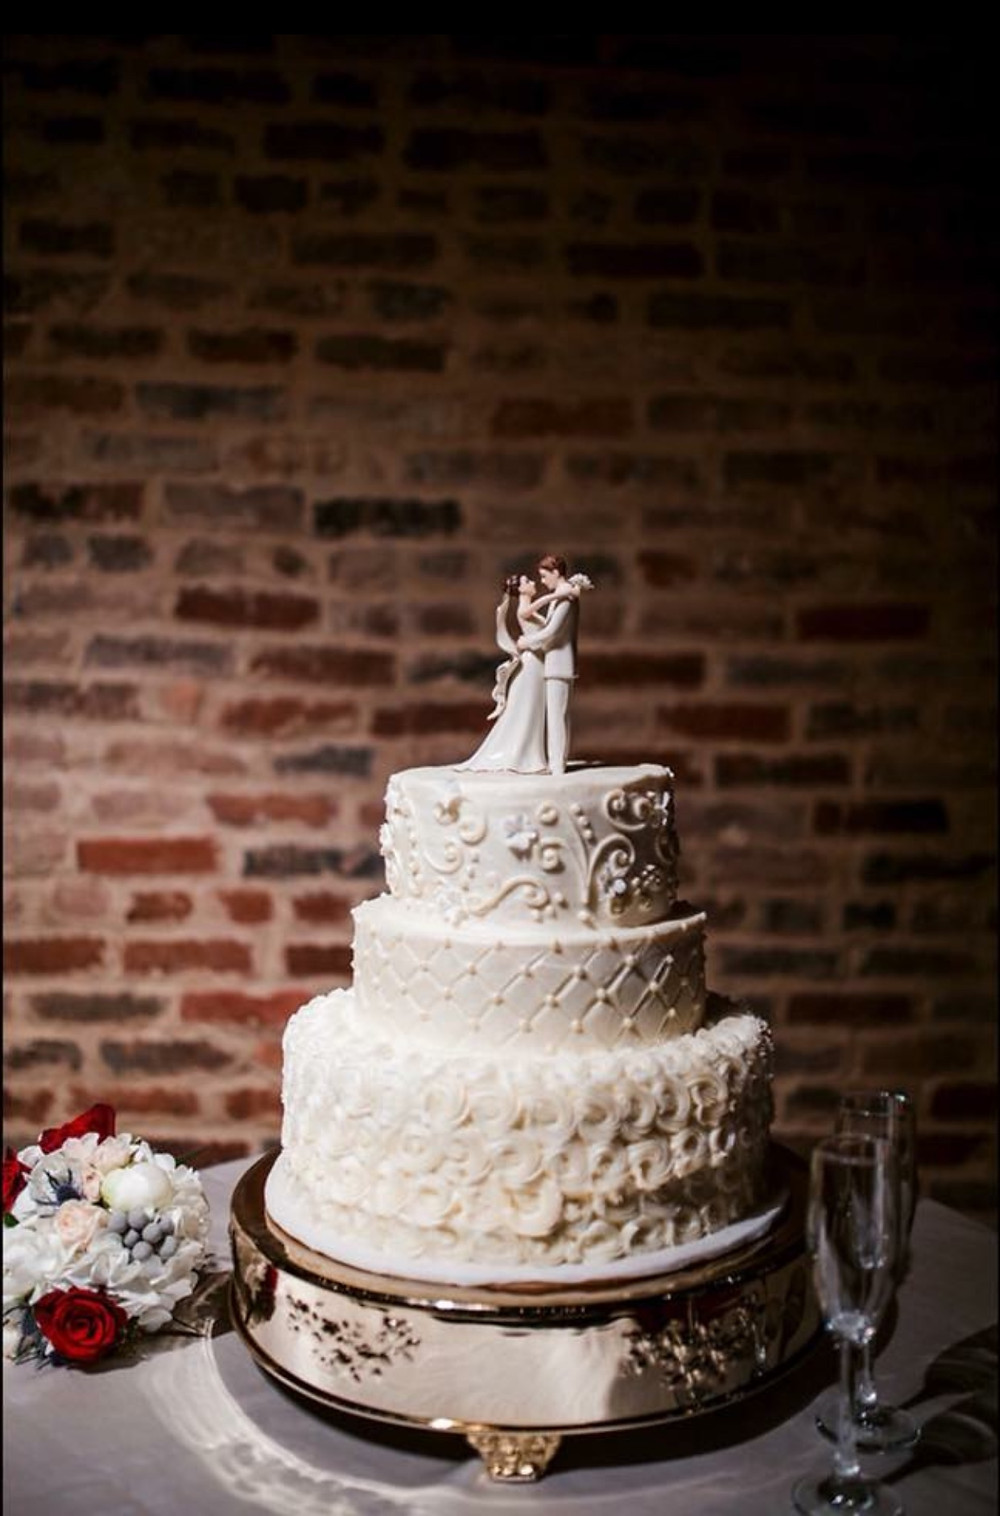 Jenifer Goode's Cakes